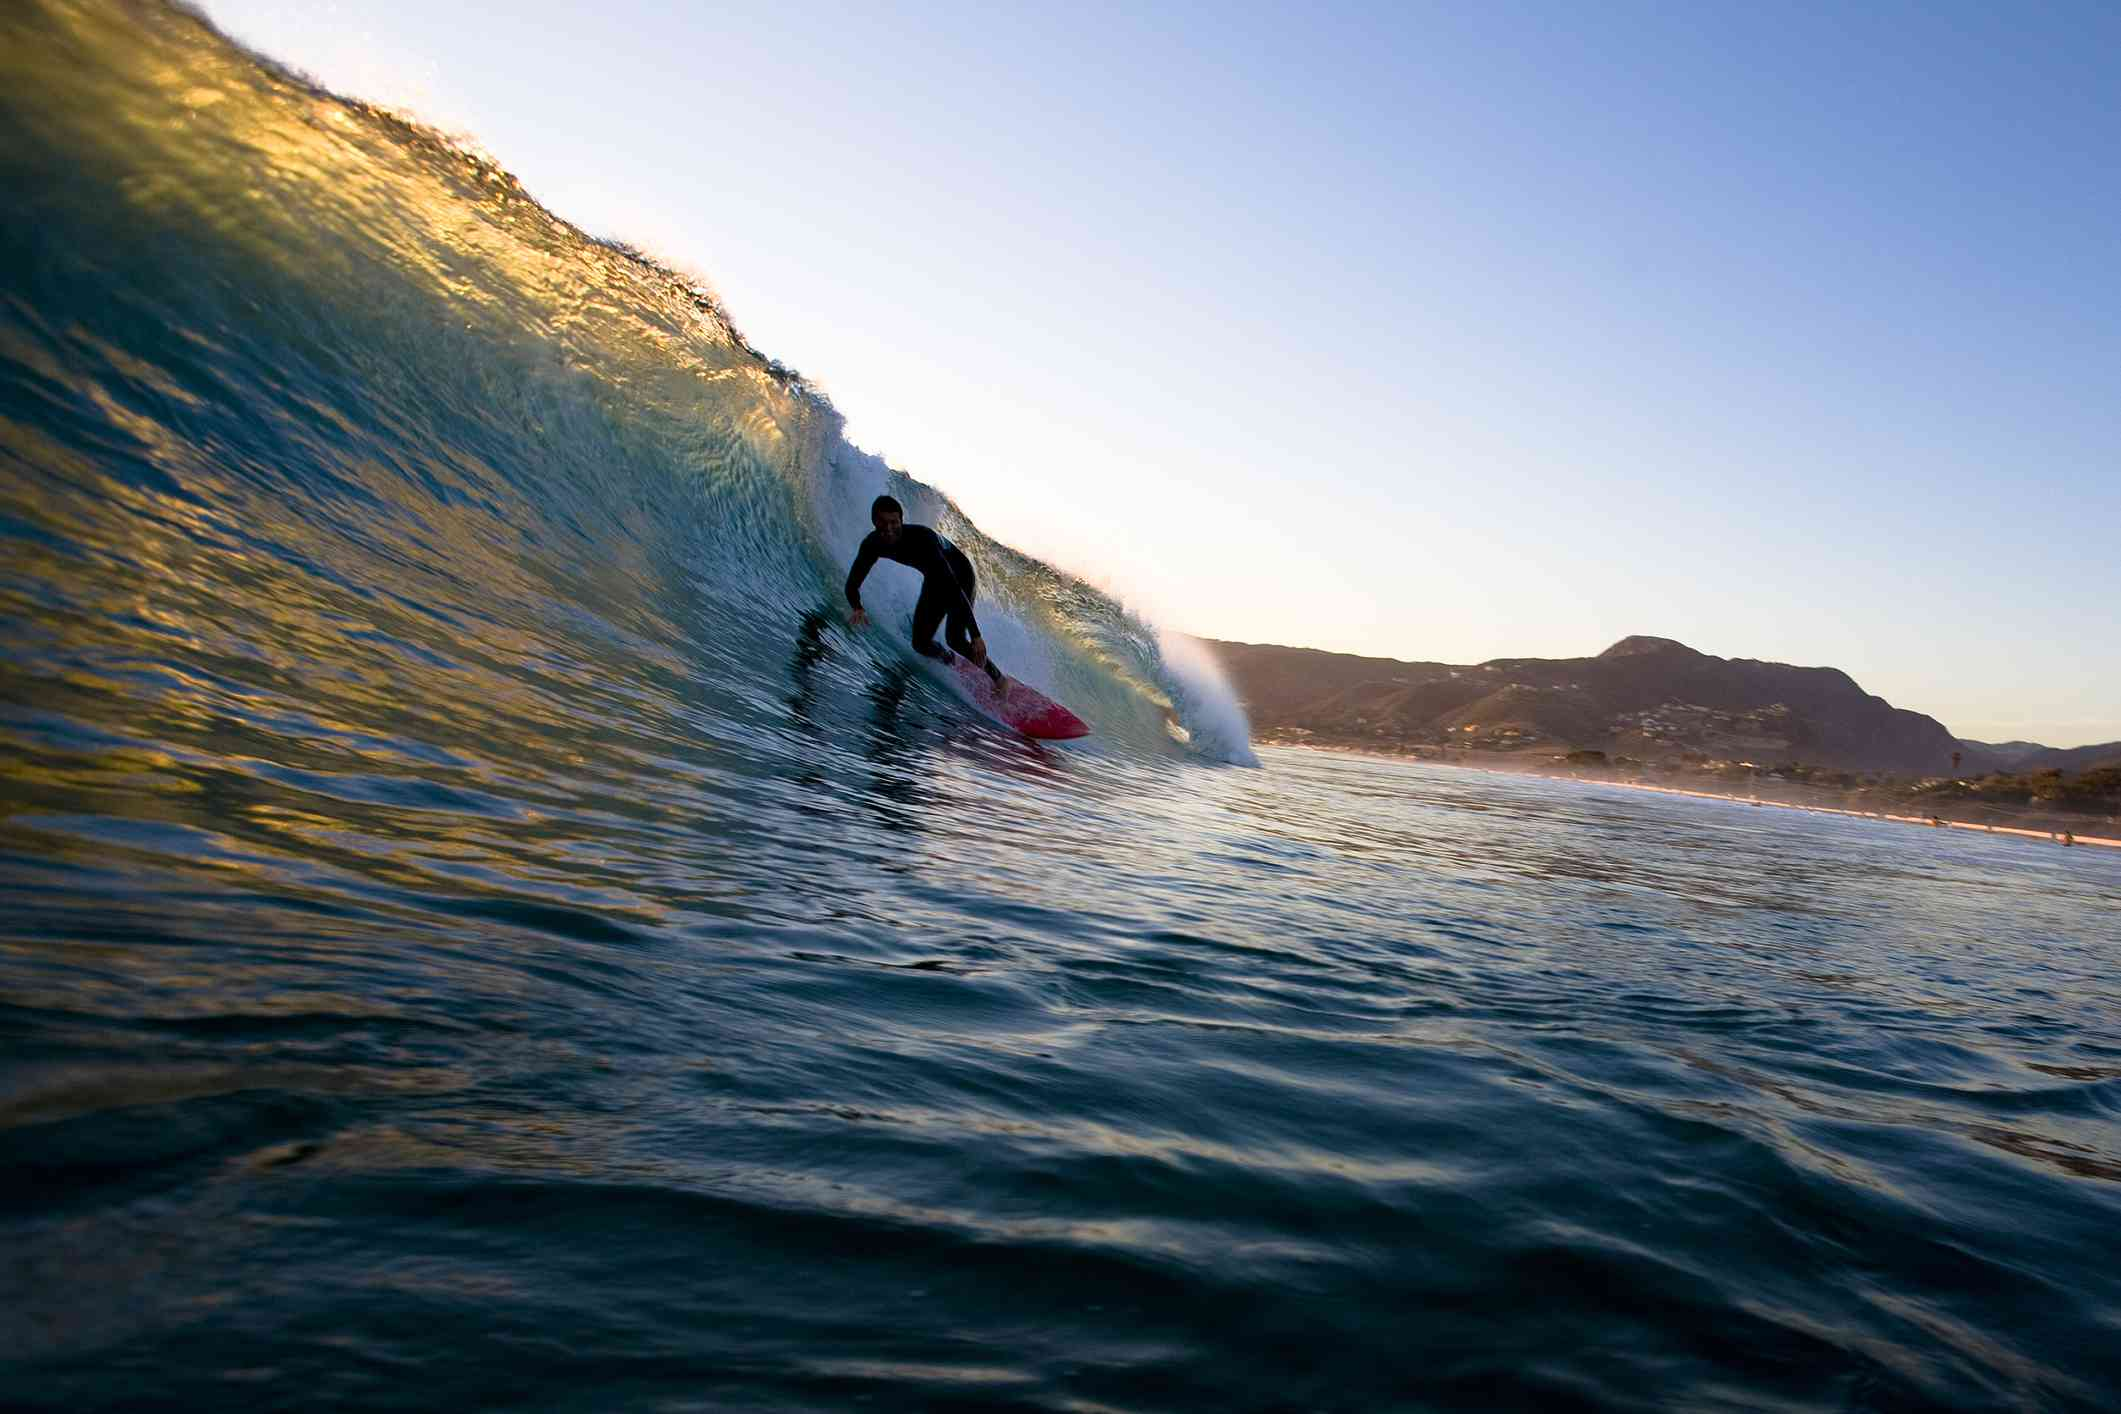 Surfer at Zuma Beach, Malibu CA